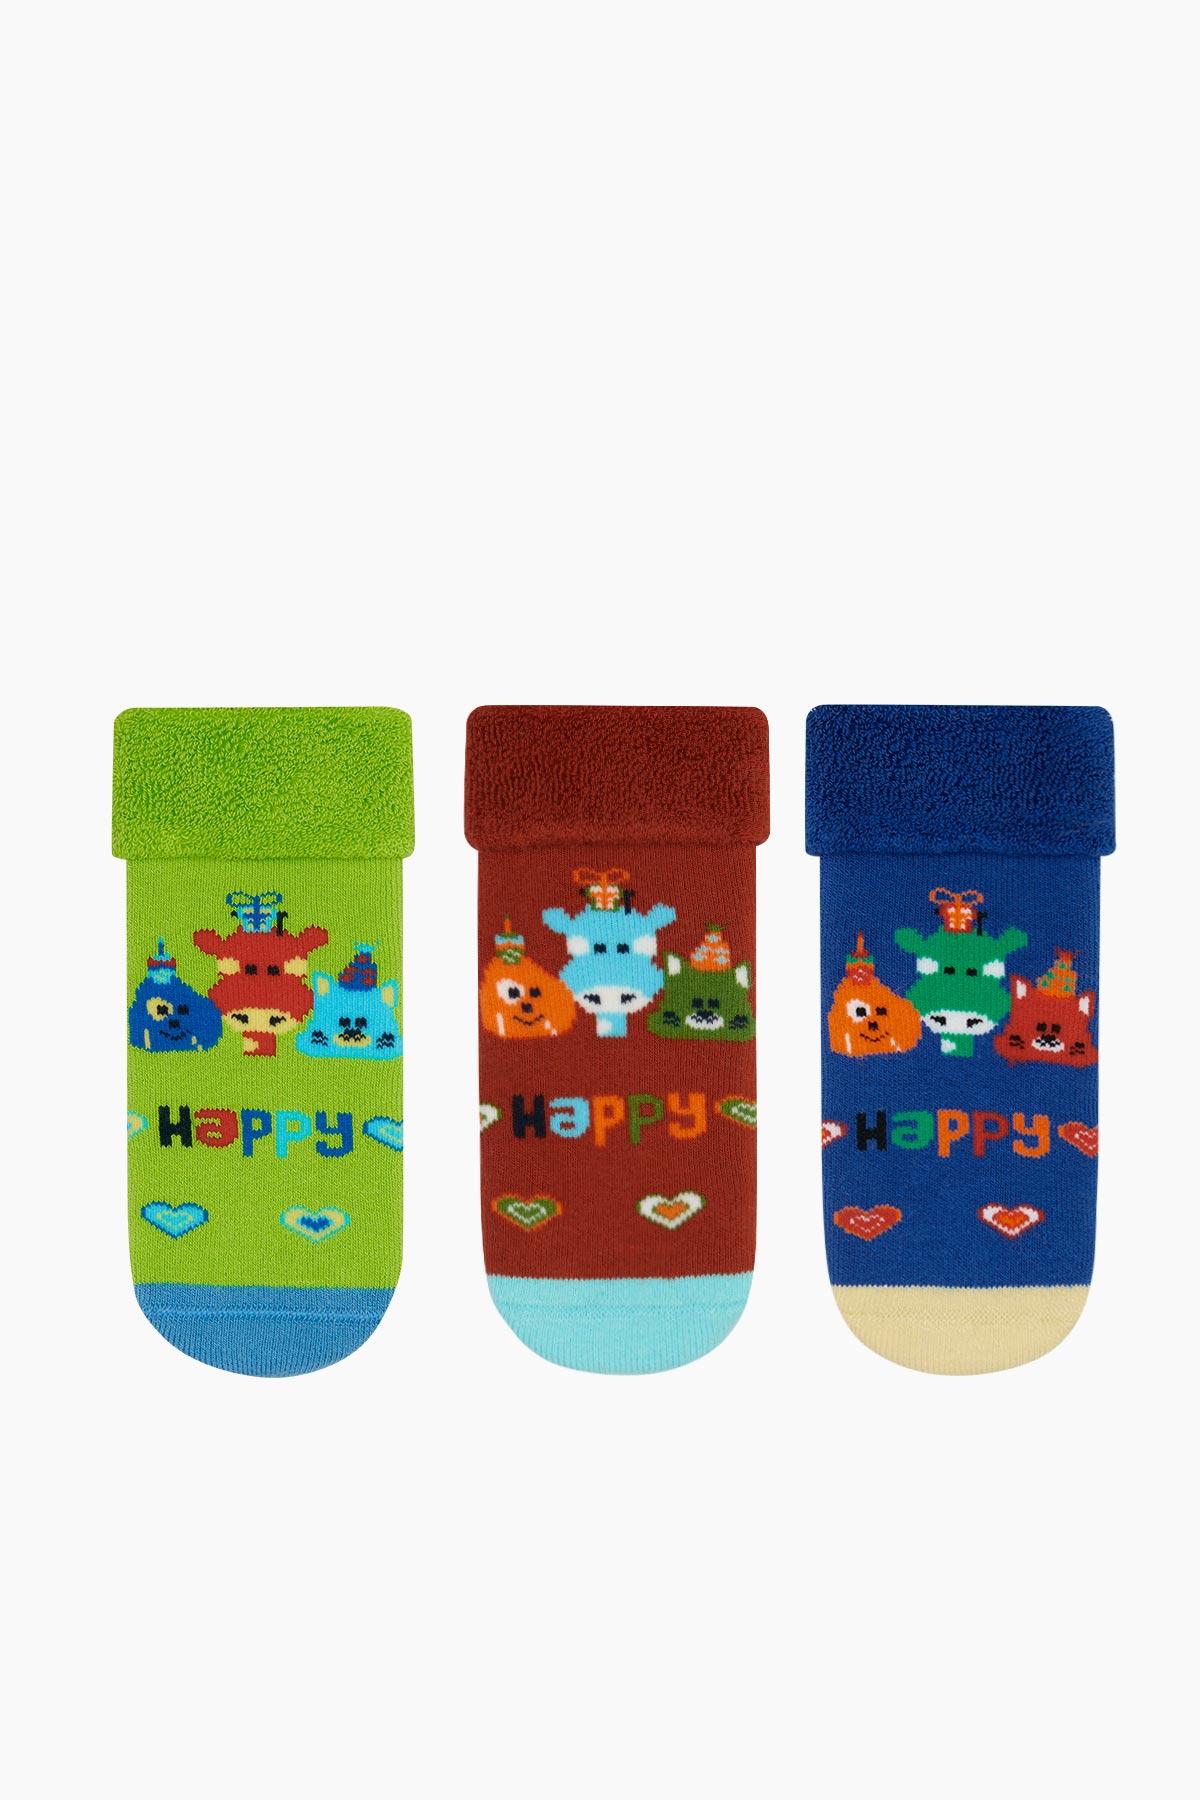 Bross - Bross 3-Pack Happy Patterned Towel Baby Socks